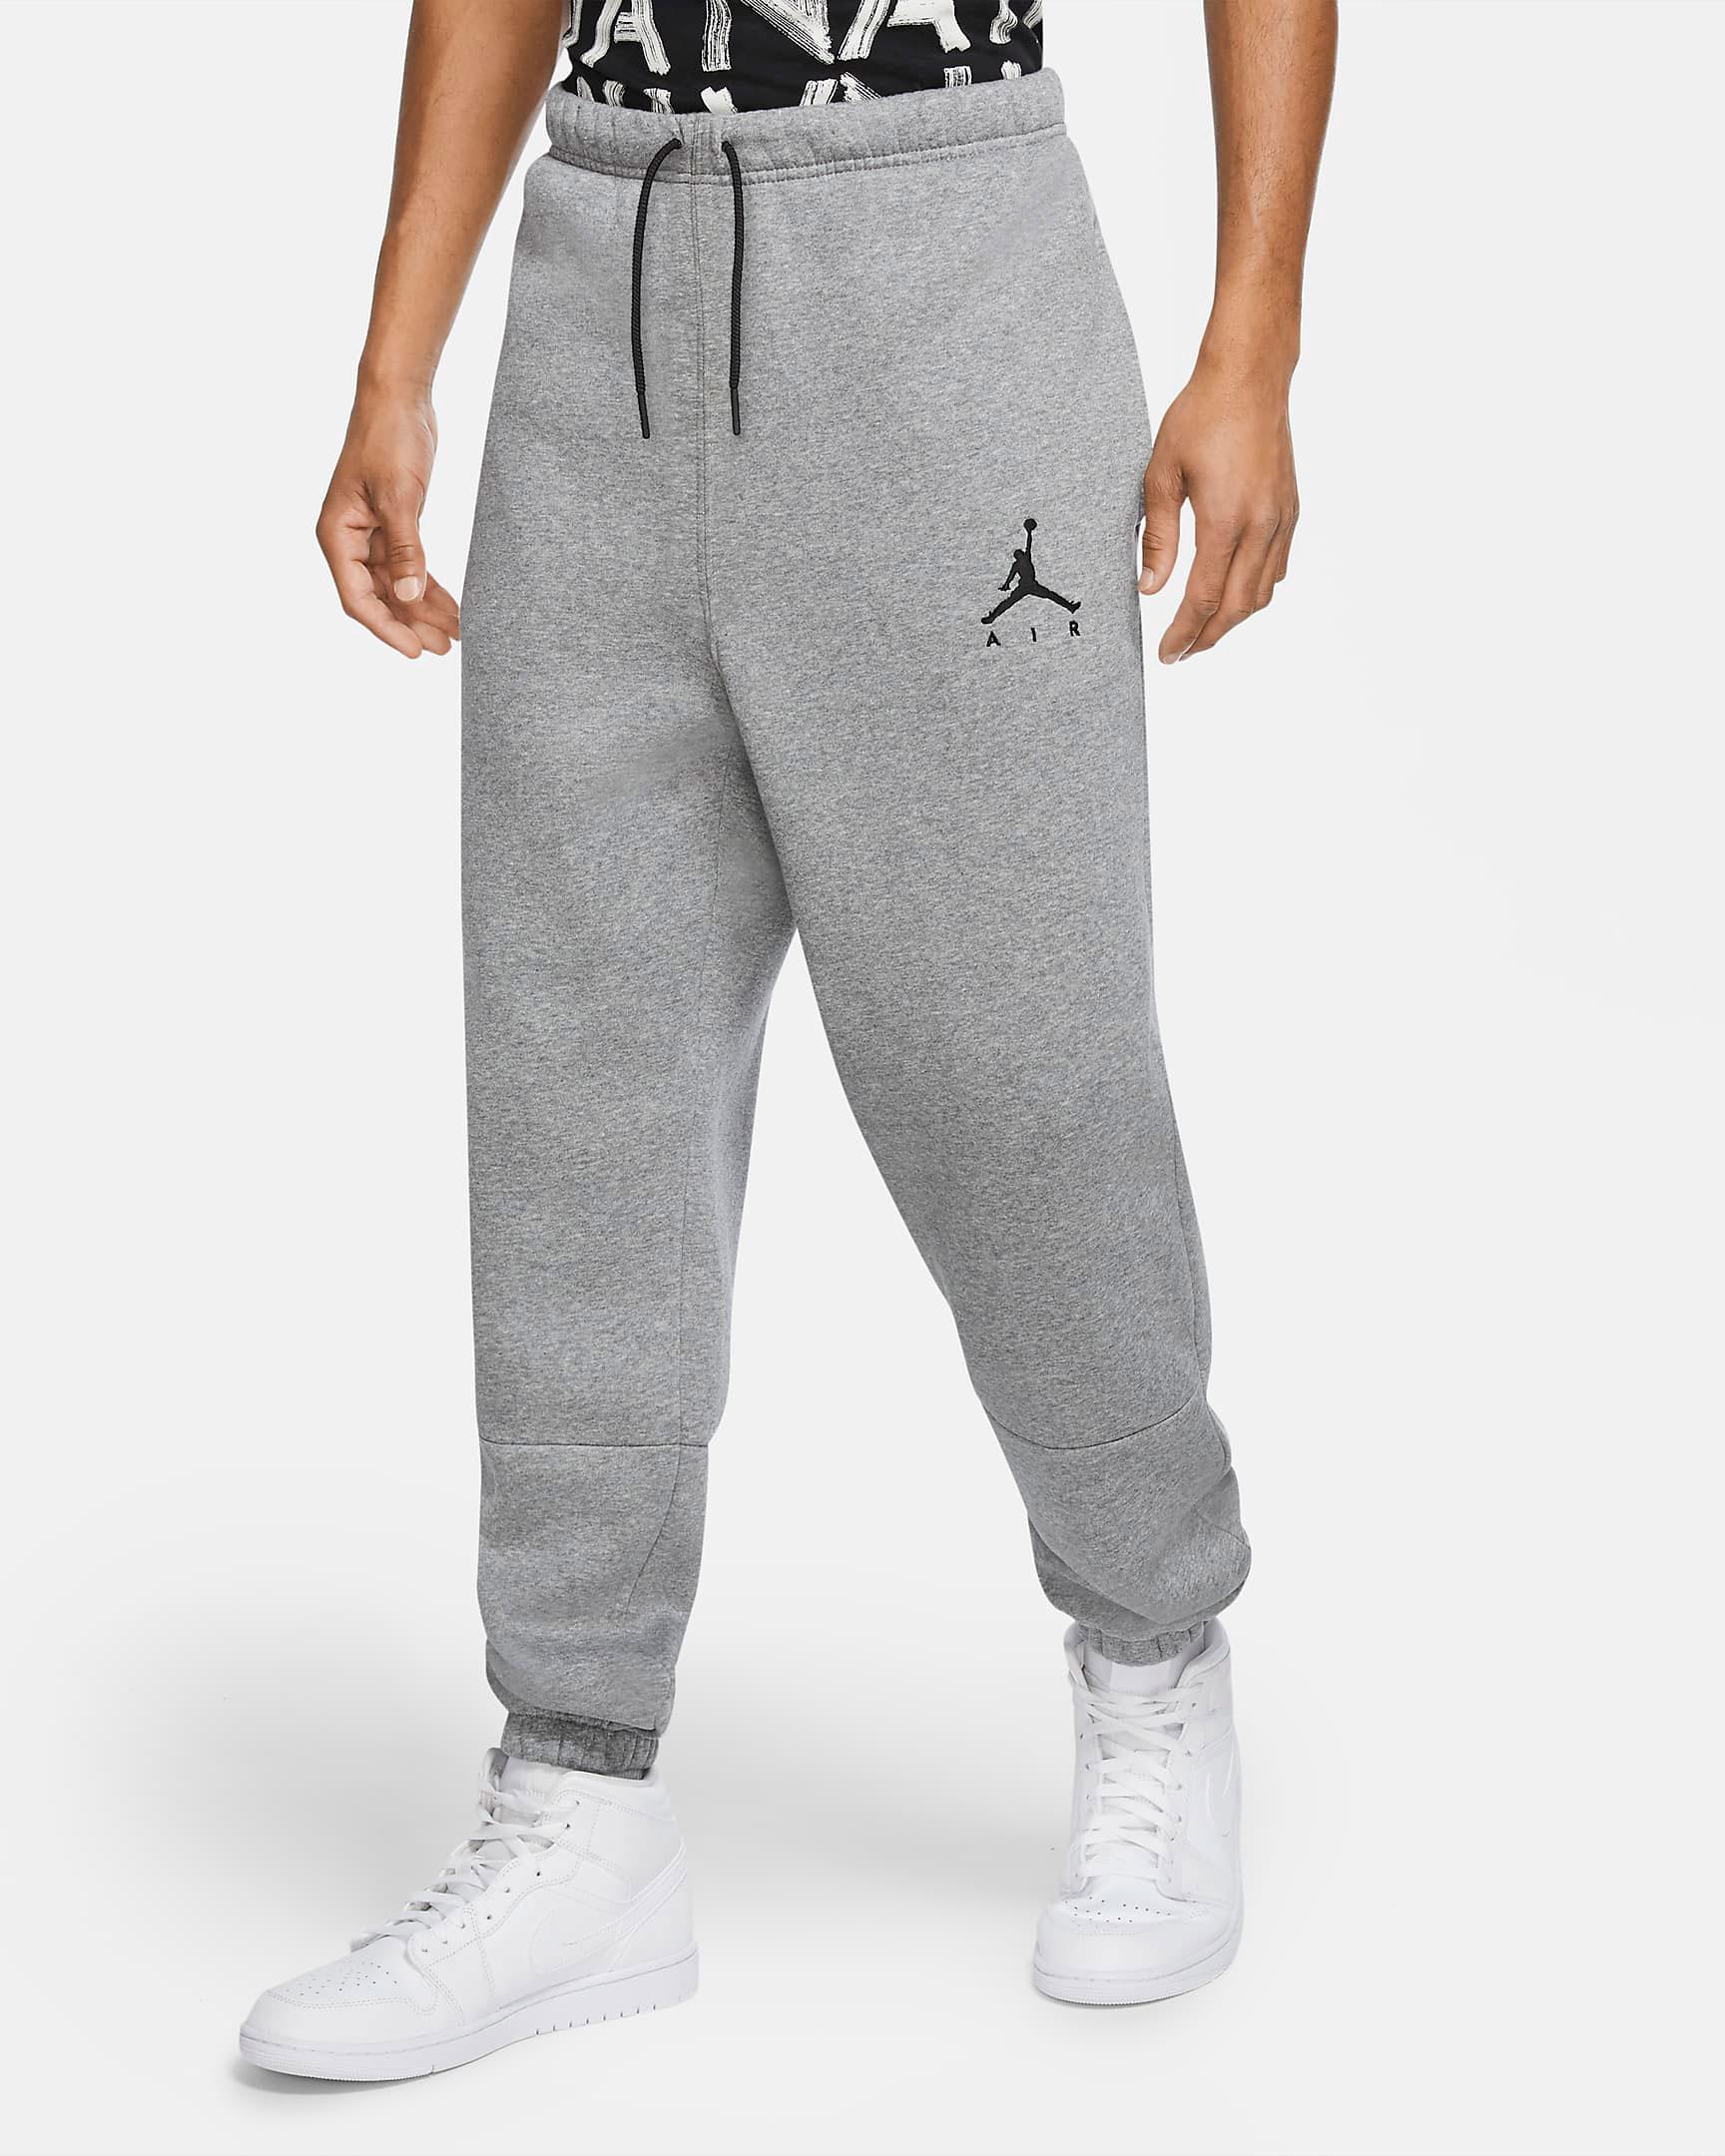 air-jordan-11-jubilee-grey-jogger-pants-match